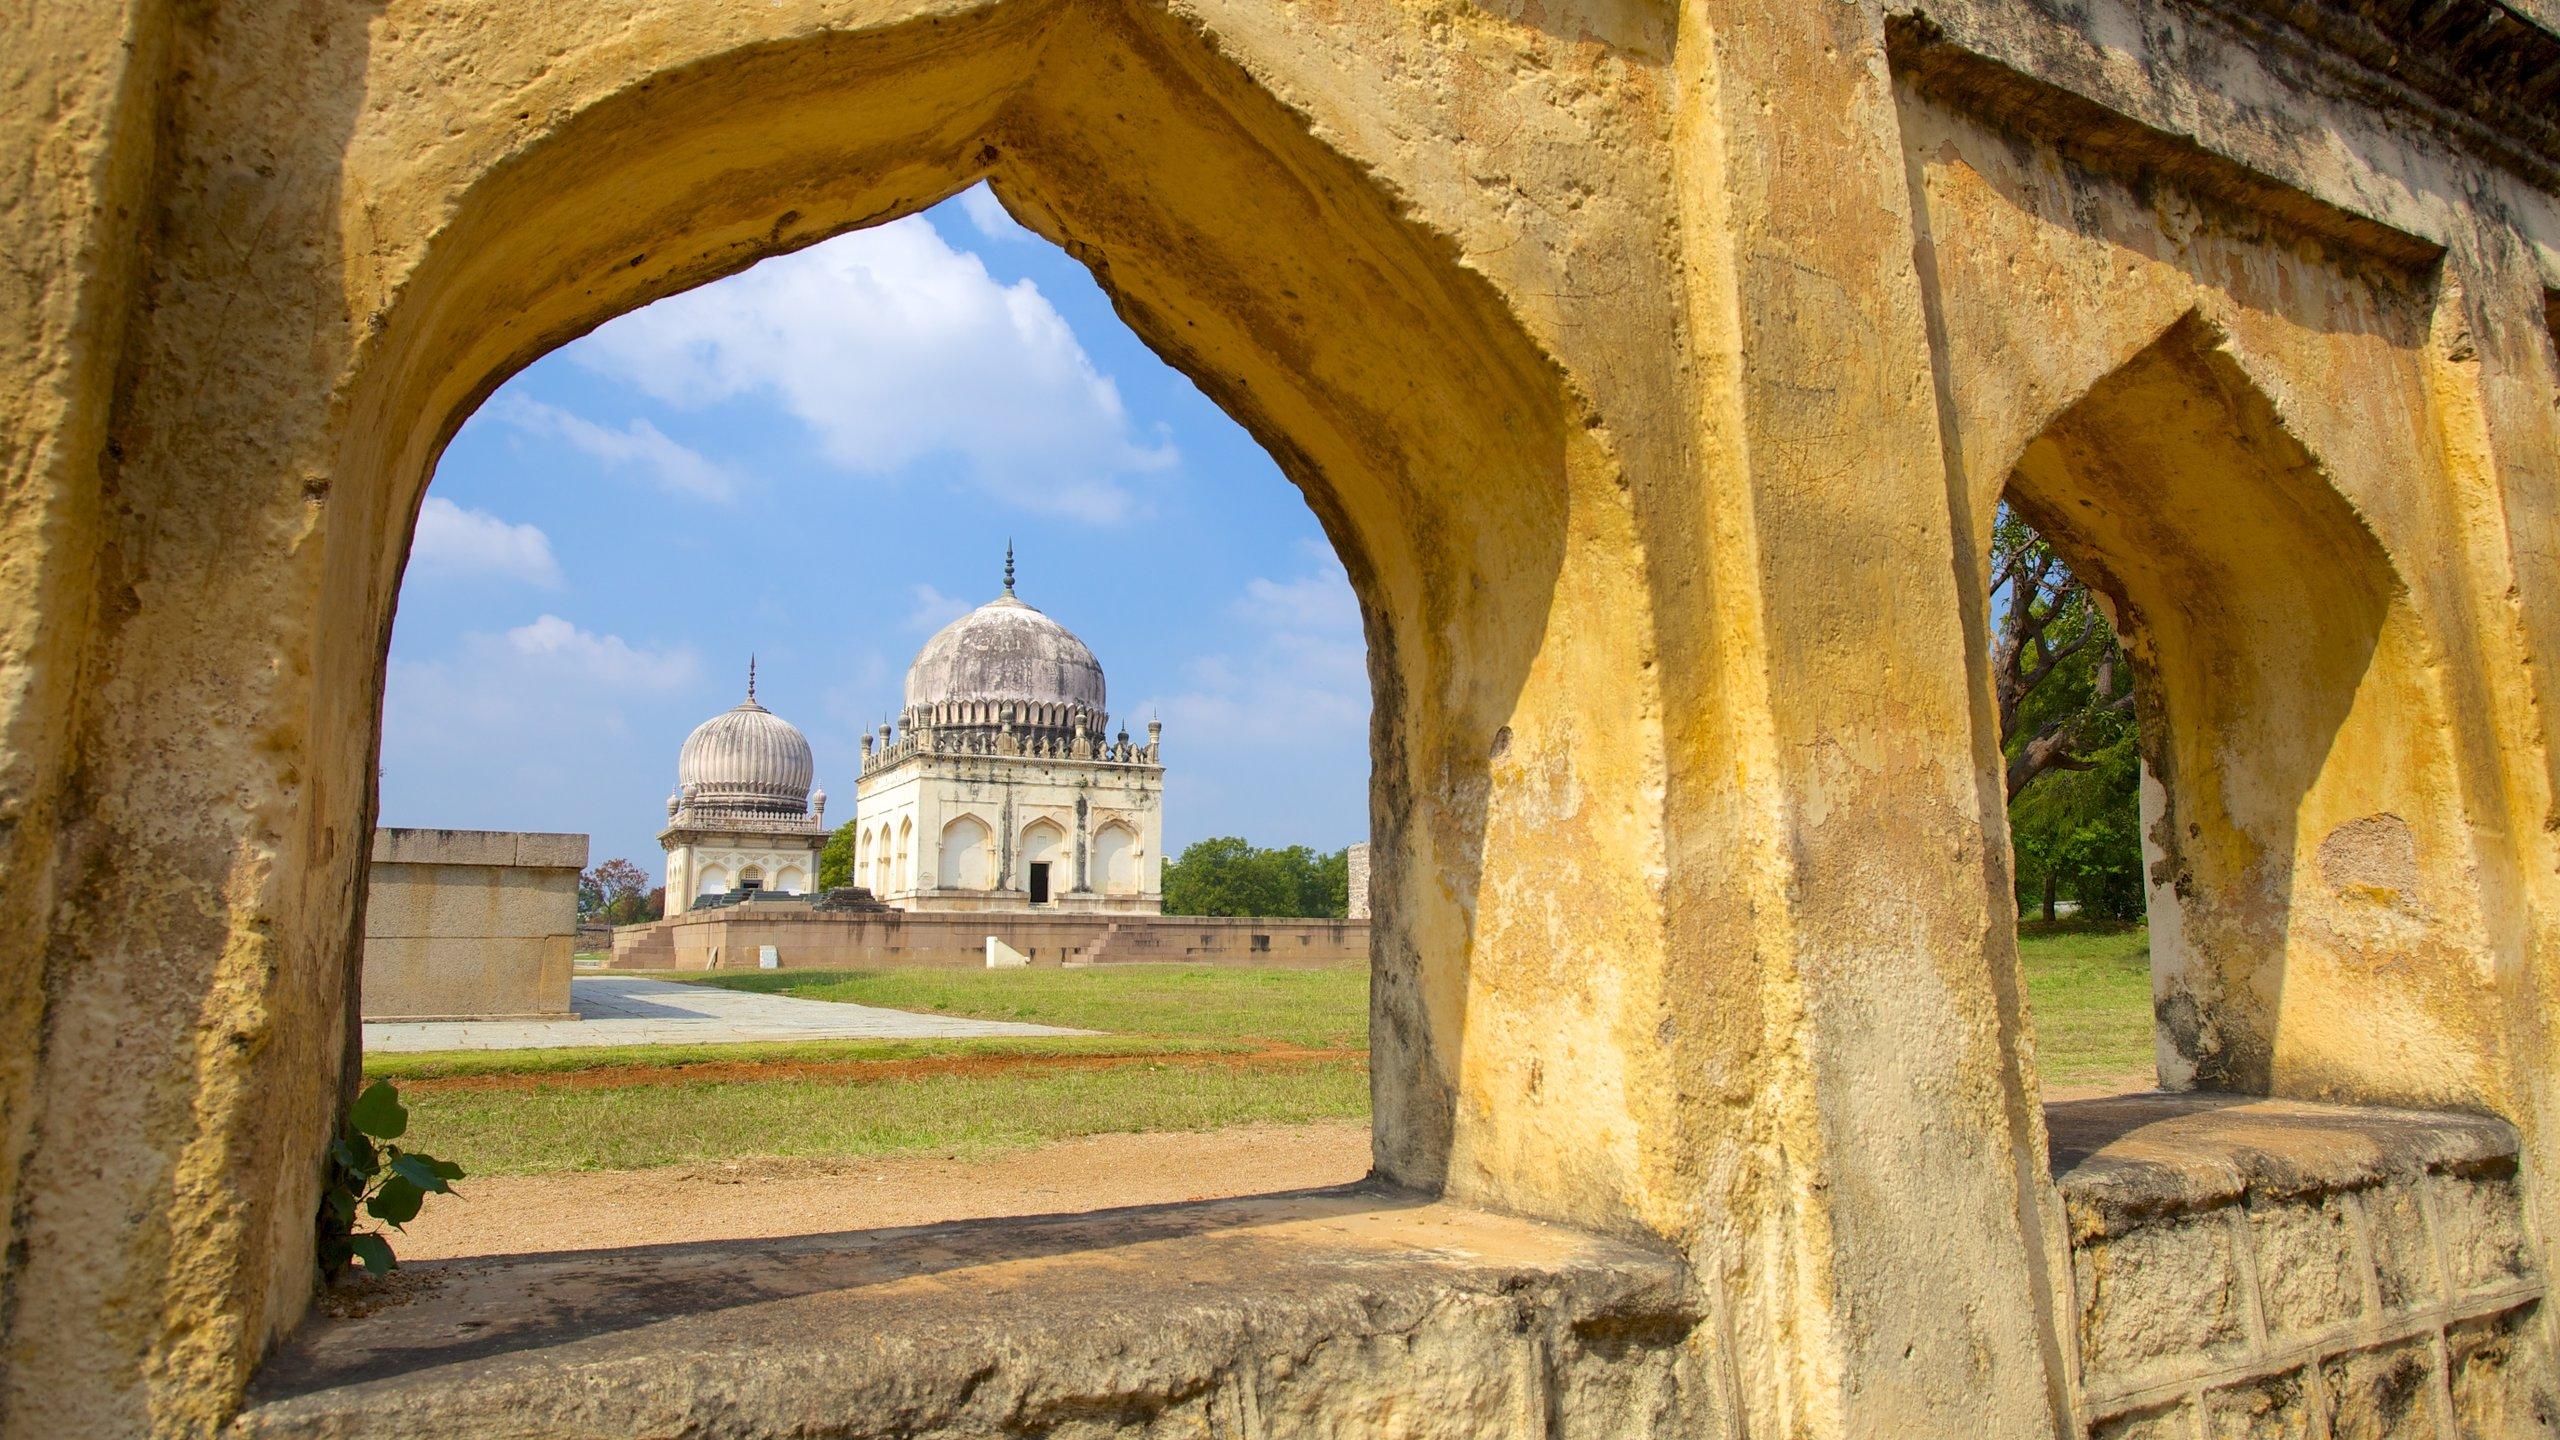 Tombes van Qutub Shahi, Hyderabad, Telangana, India